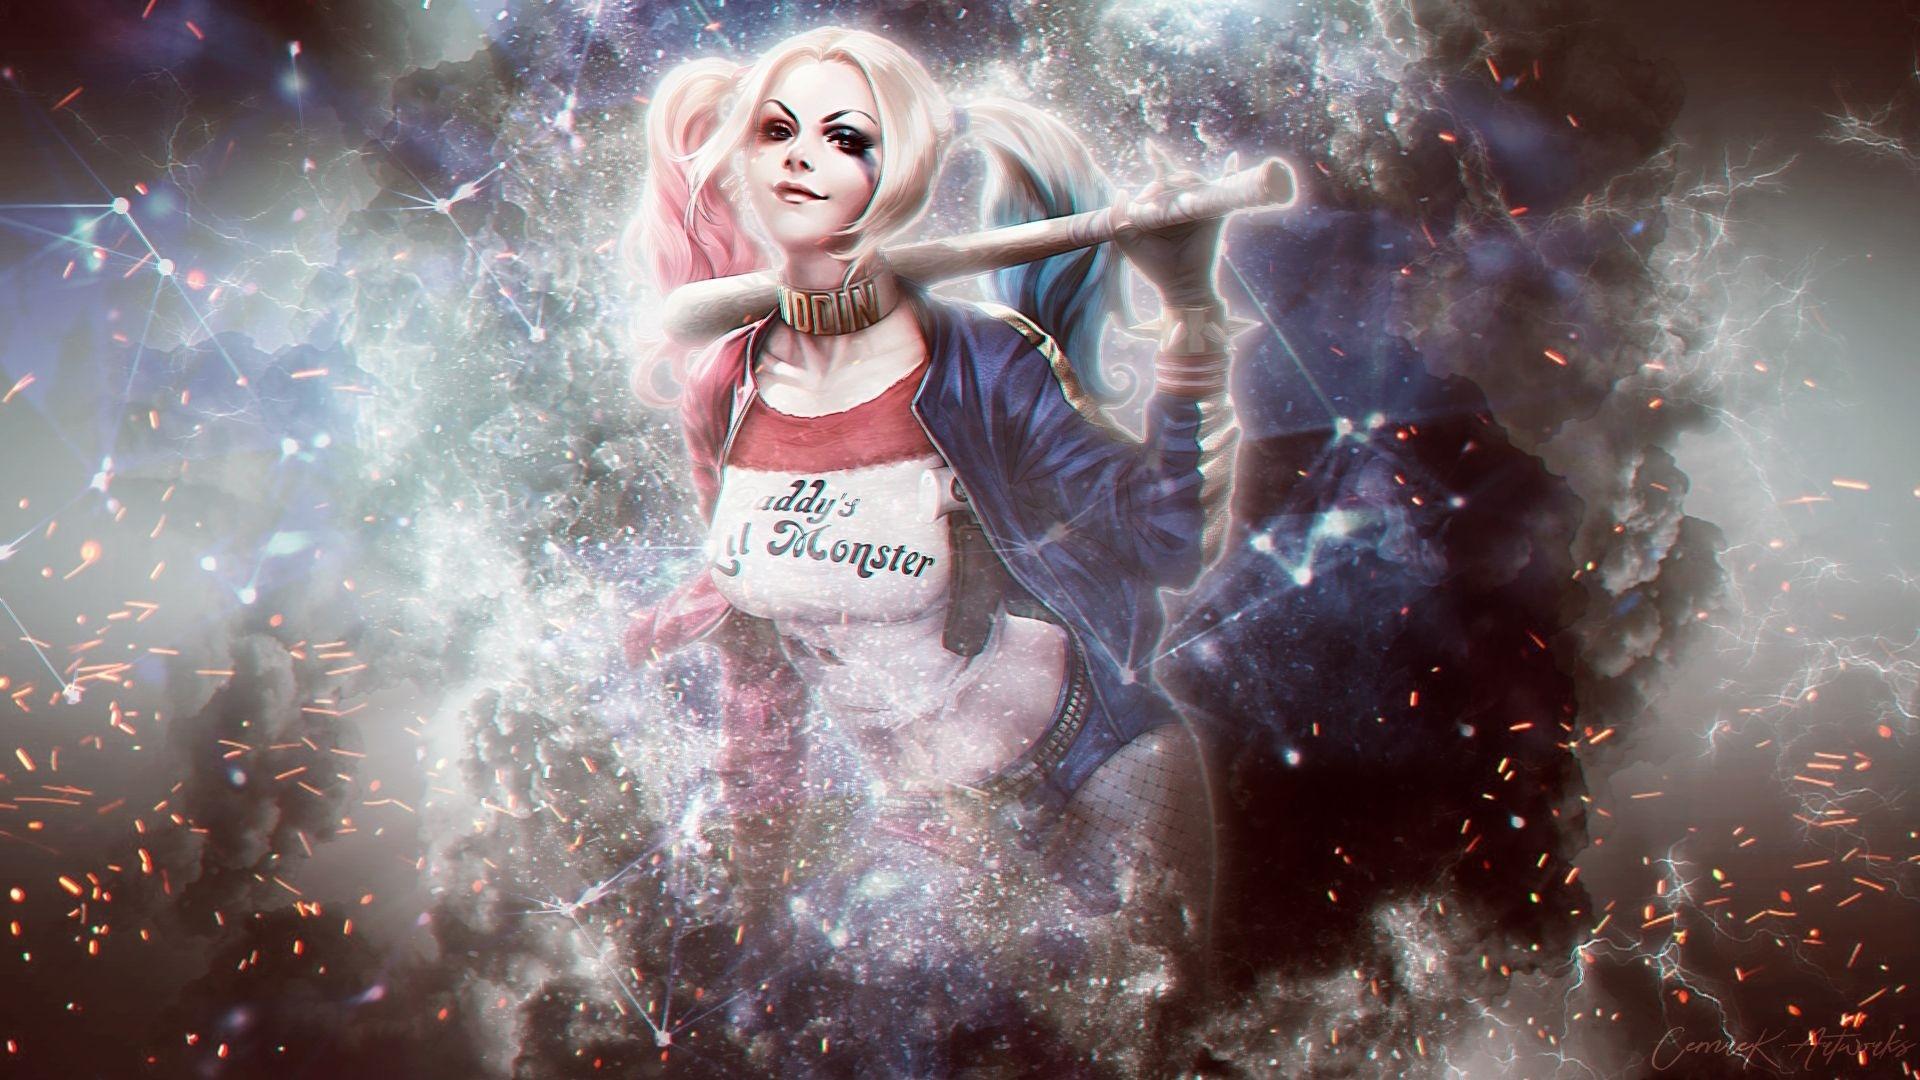 Harley Quinn hd background